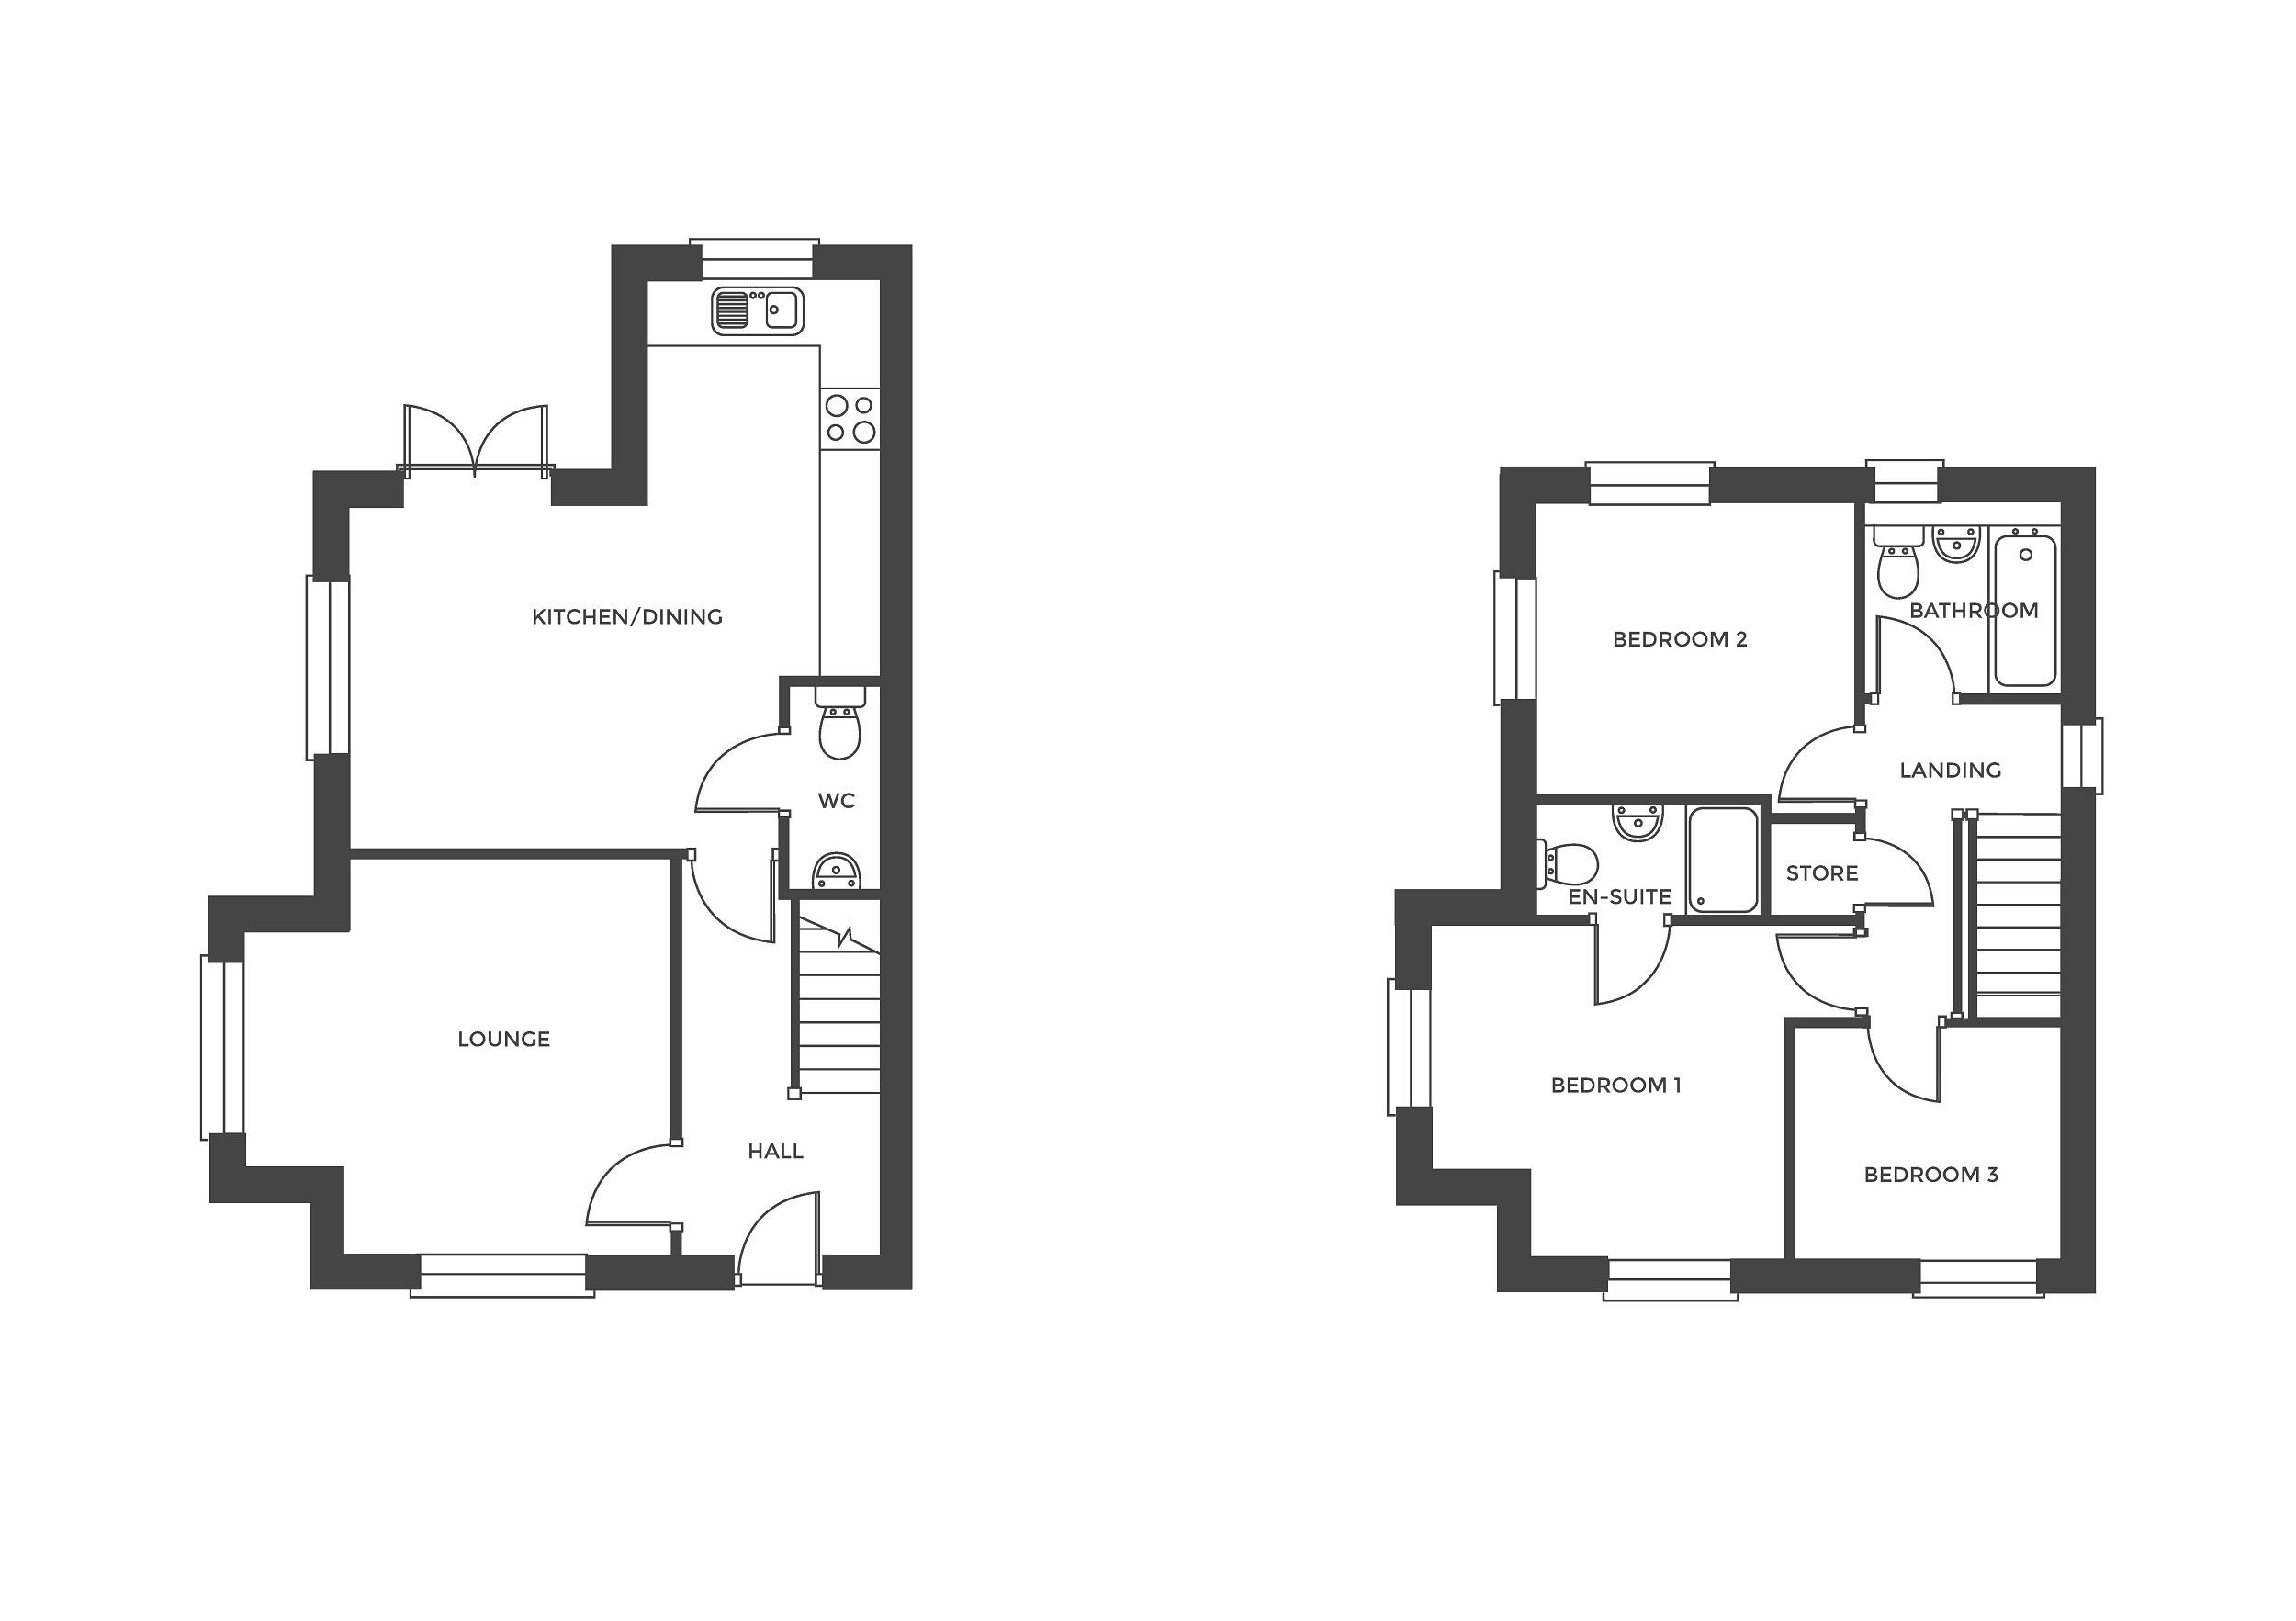 Acresford Park, Plot 35 floor plan